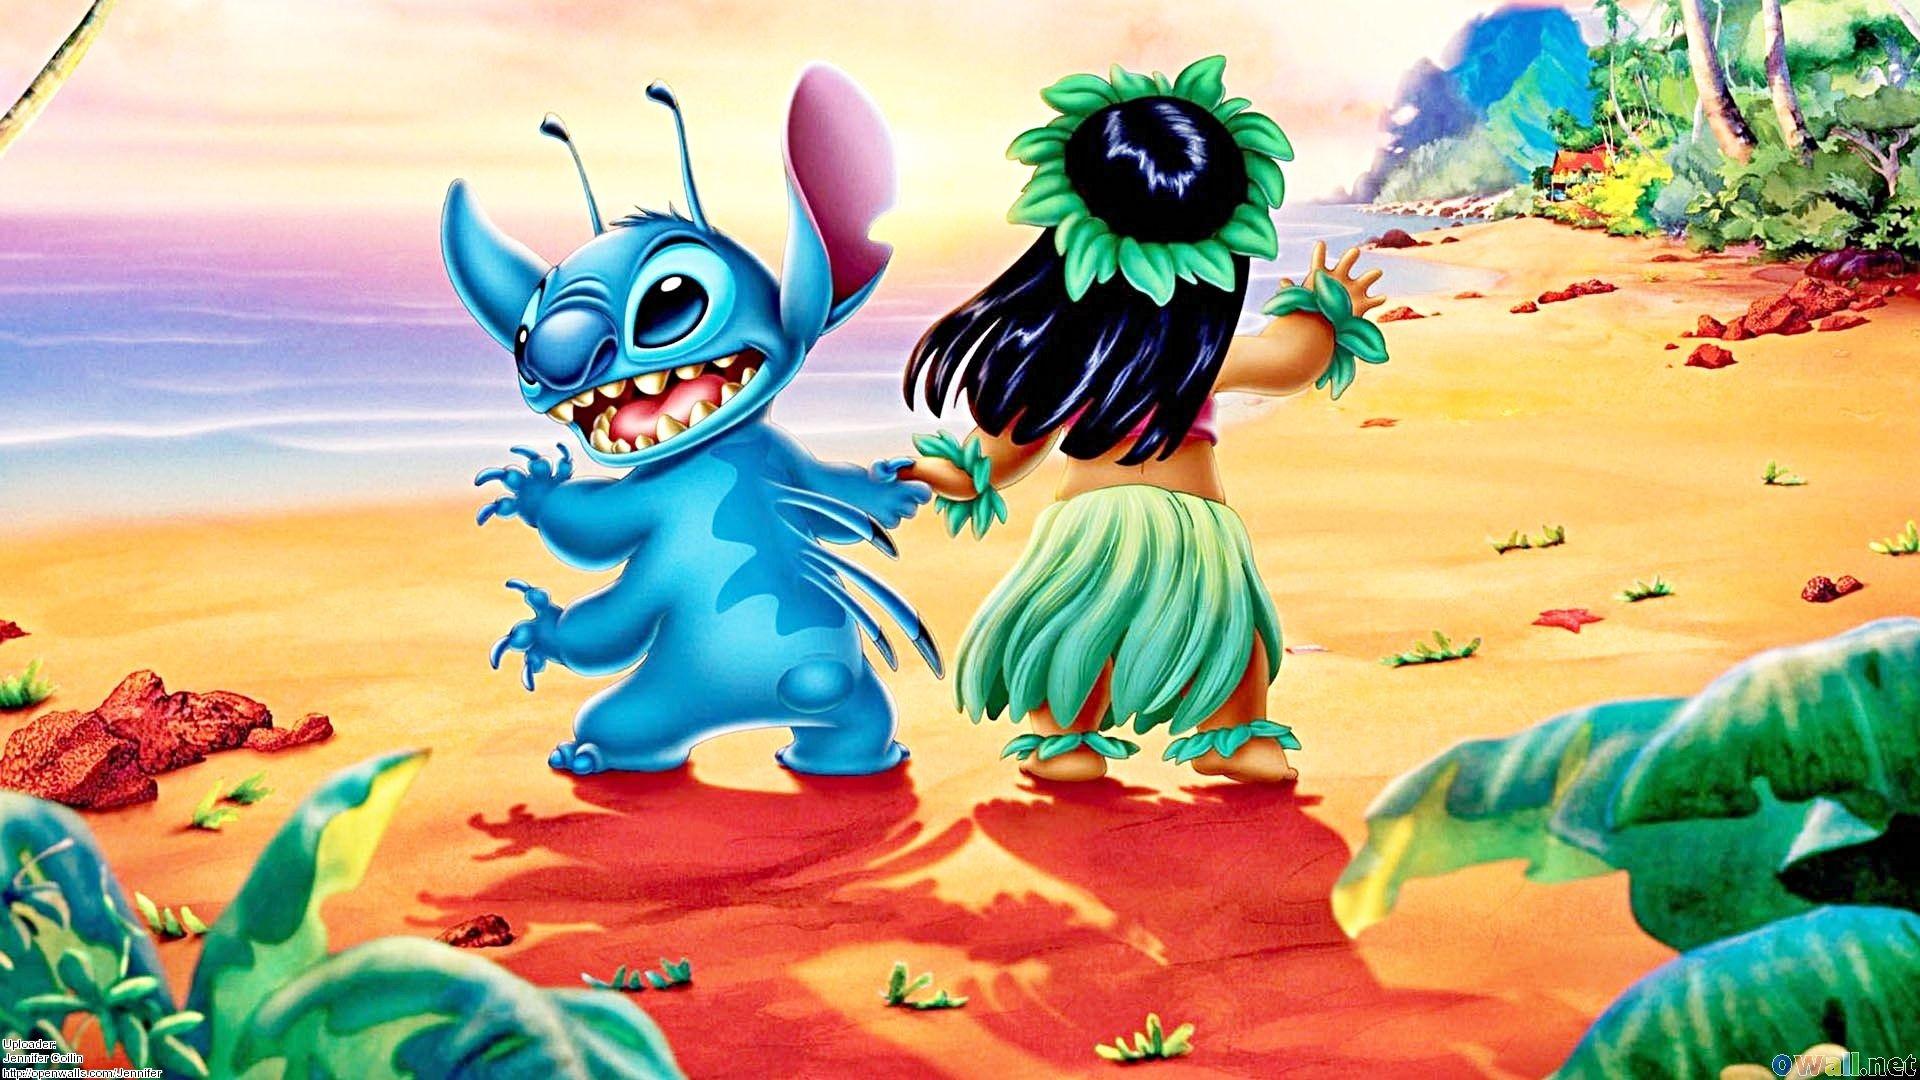 Lilo And Stitch Wallpaper Desktop 62 Images